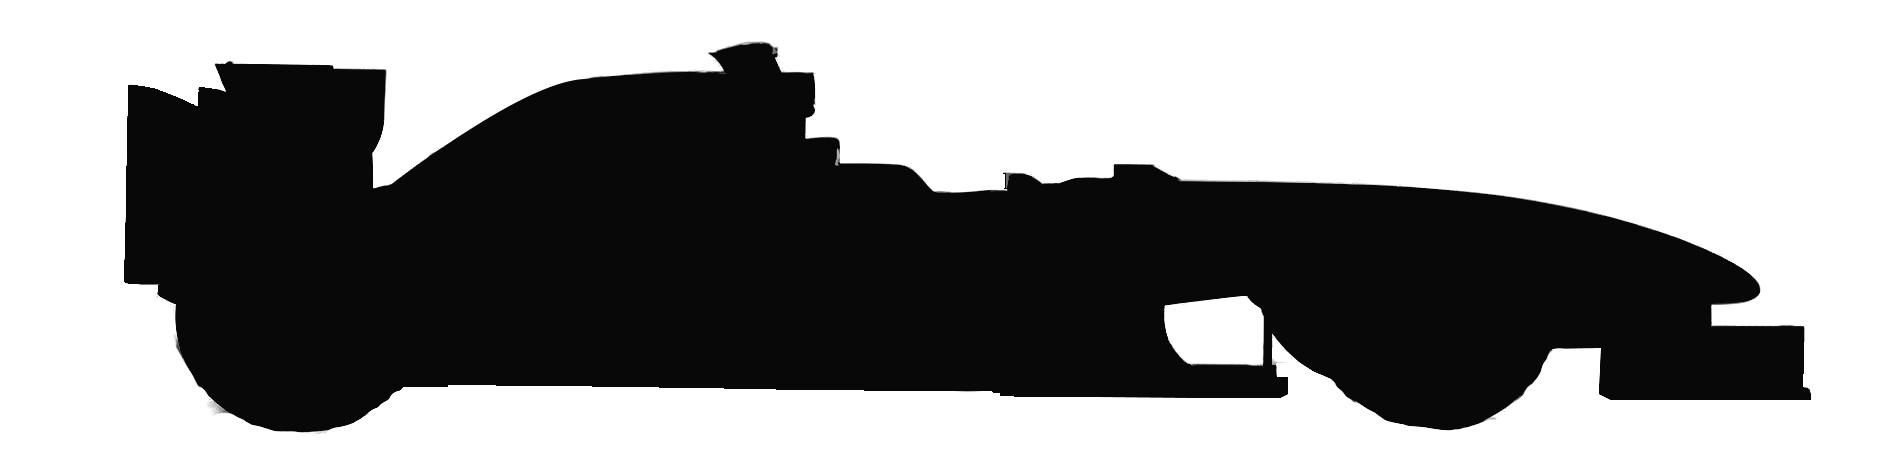 F1 Car Silhouette